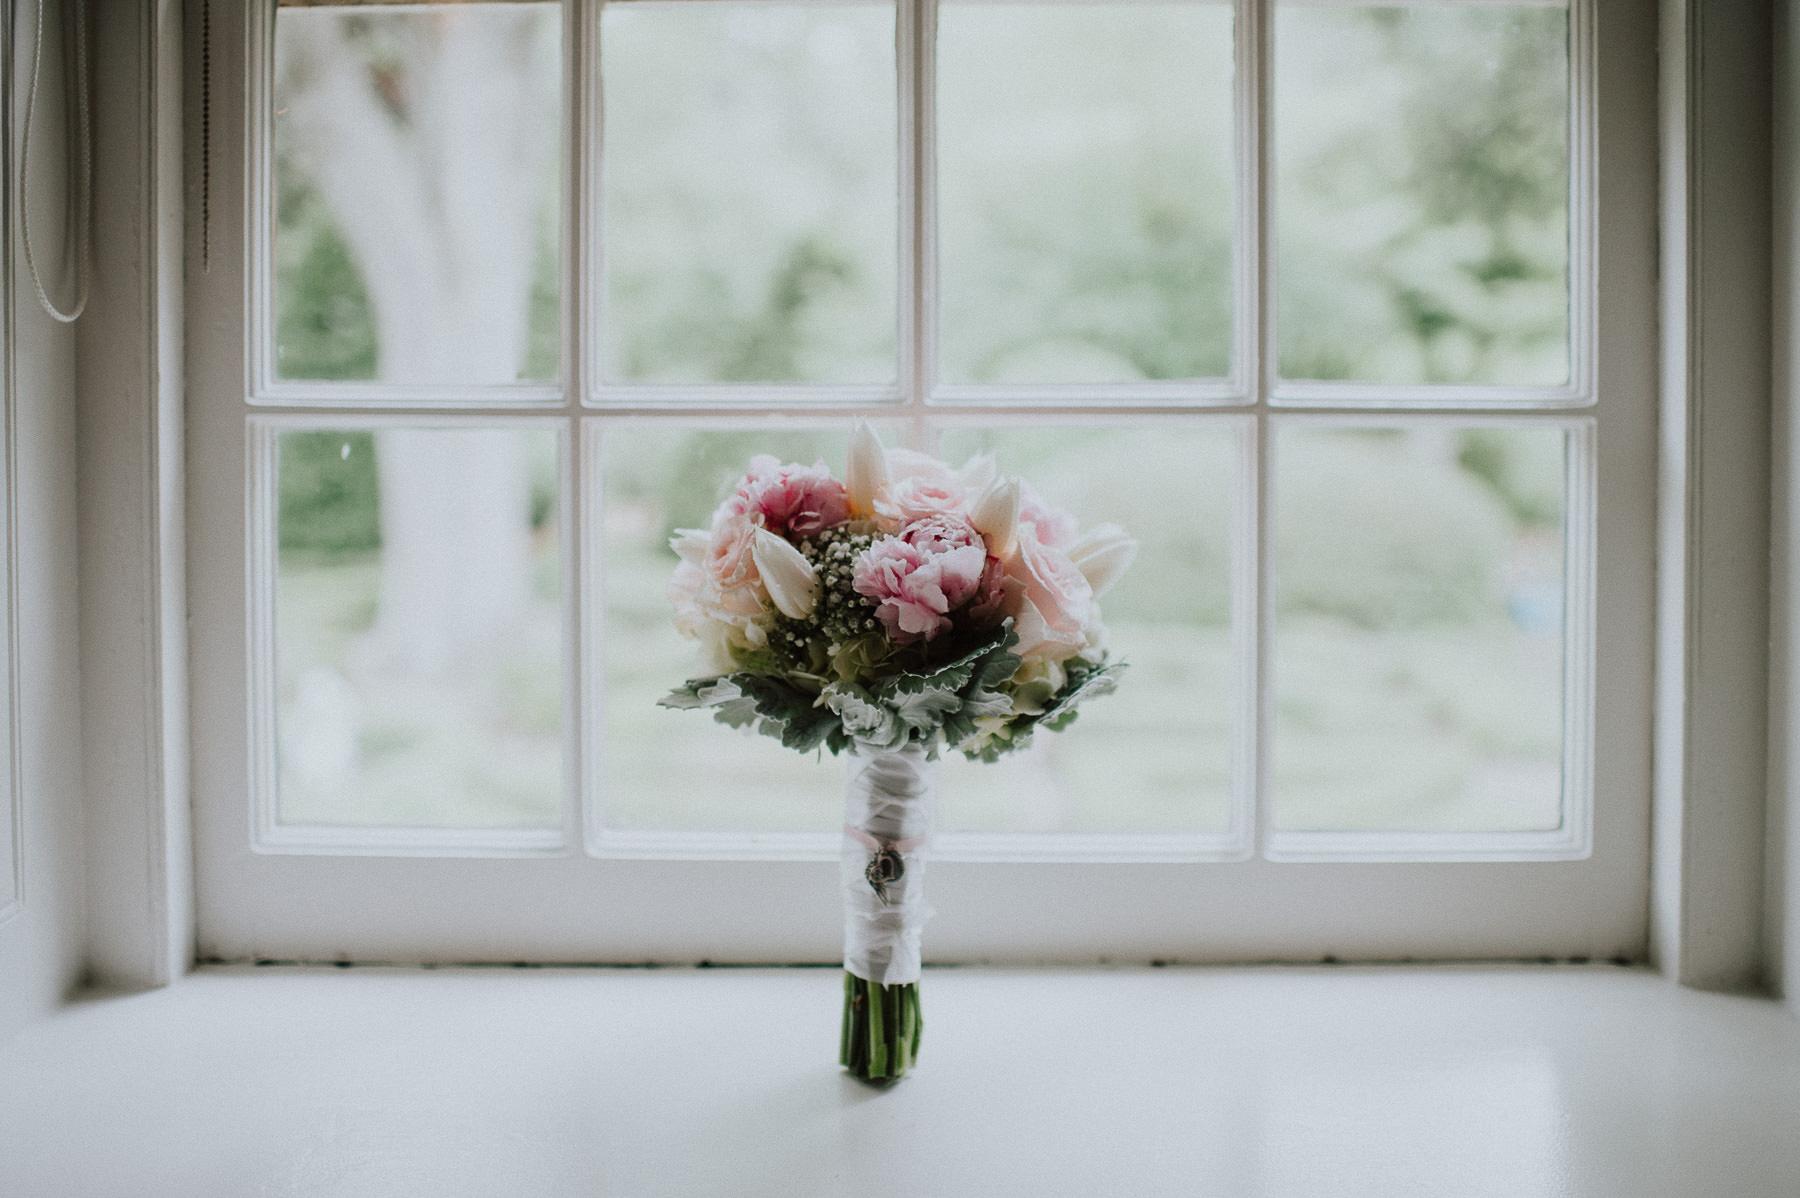 appleford-estate-wedding-photography-11.jpg